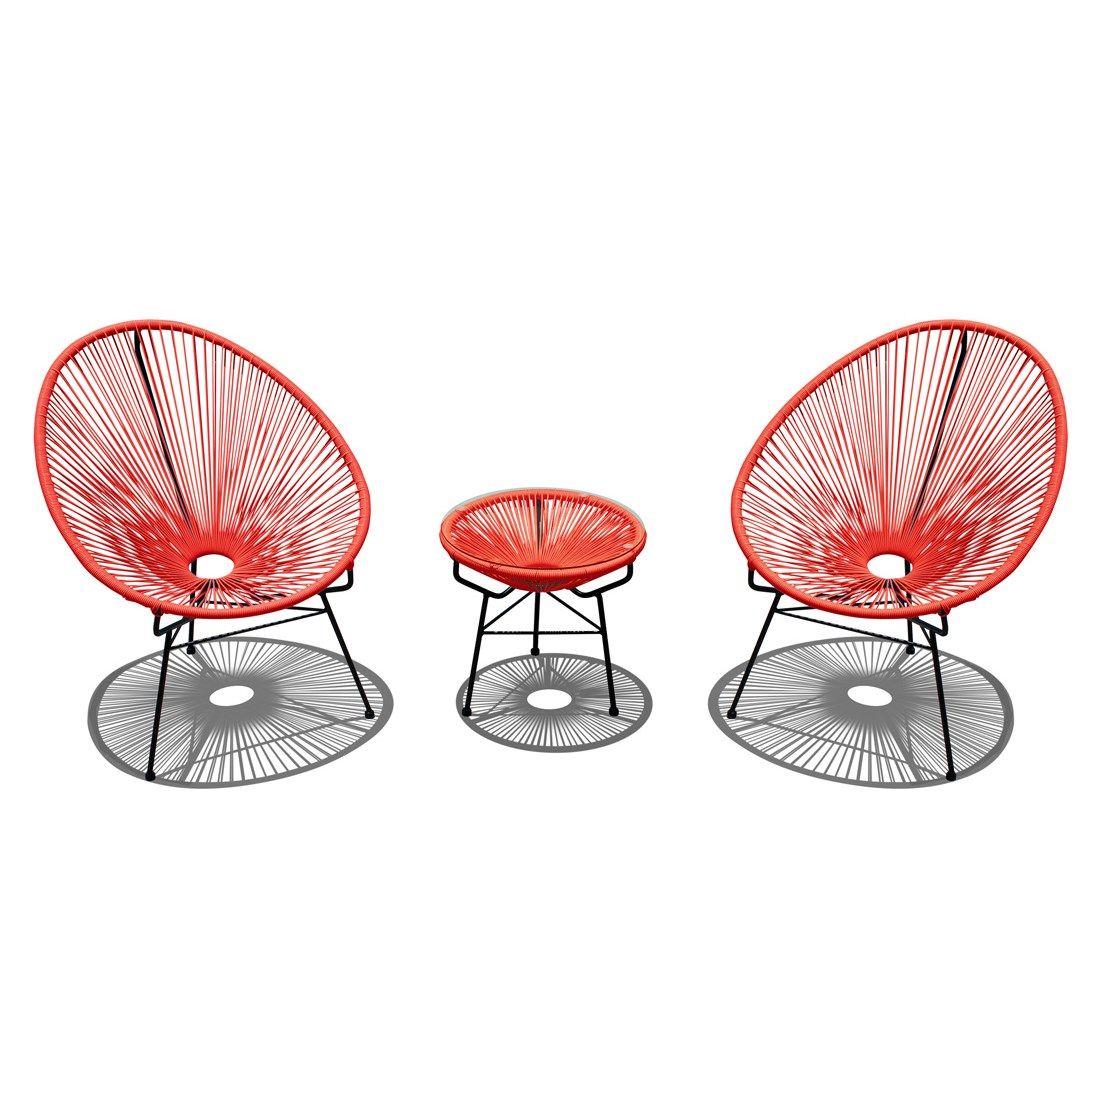 Sofalounge Chair Bobbydaleearnhardt.com